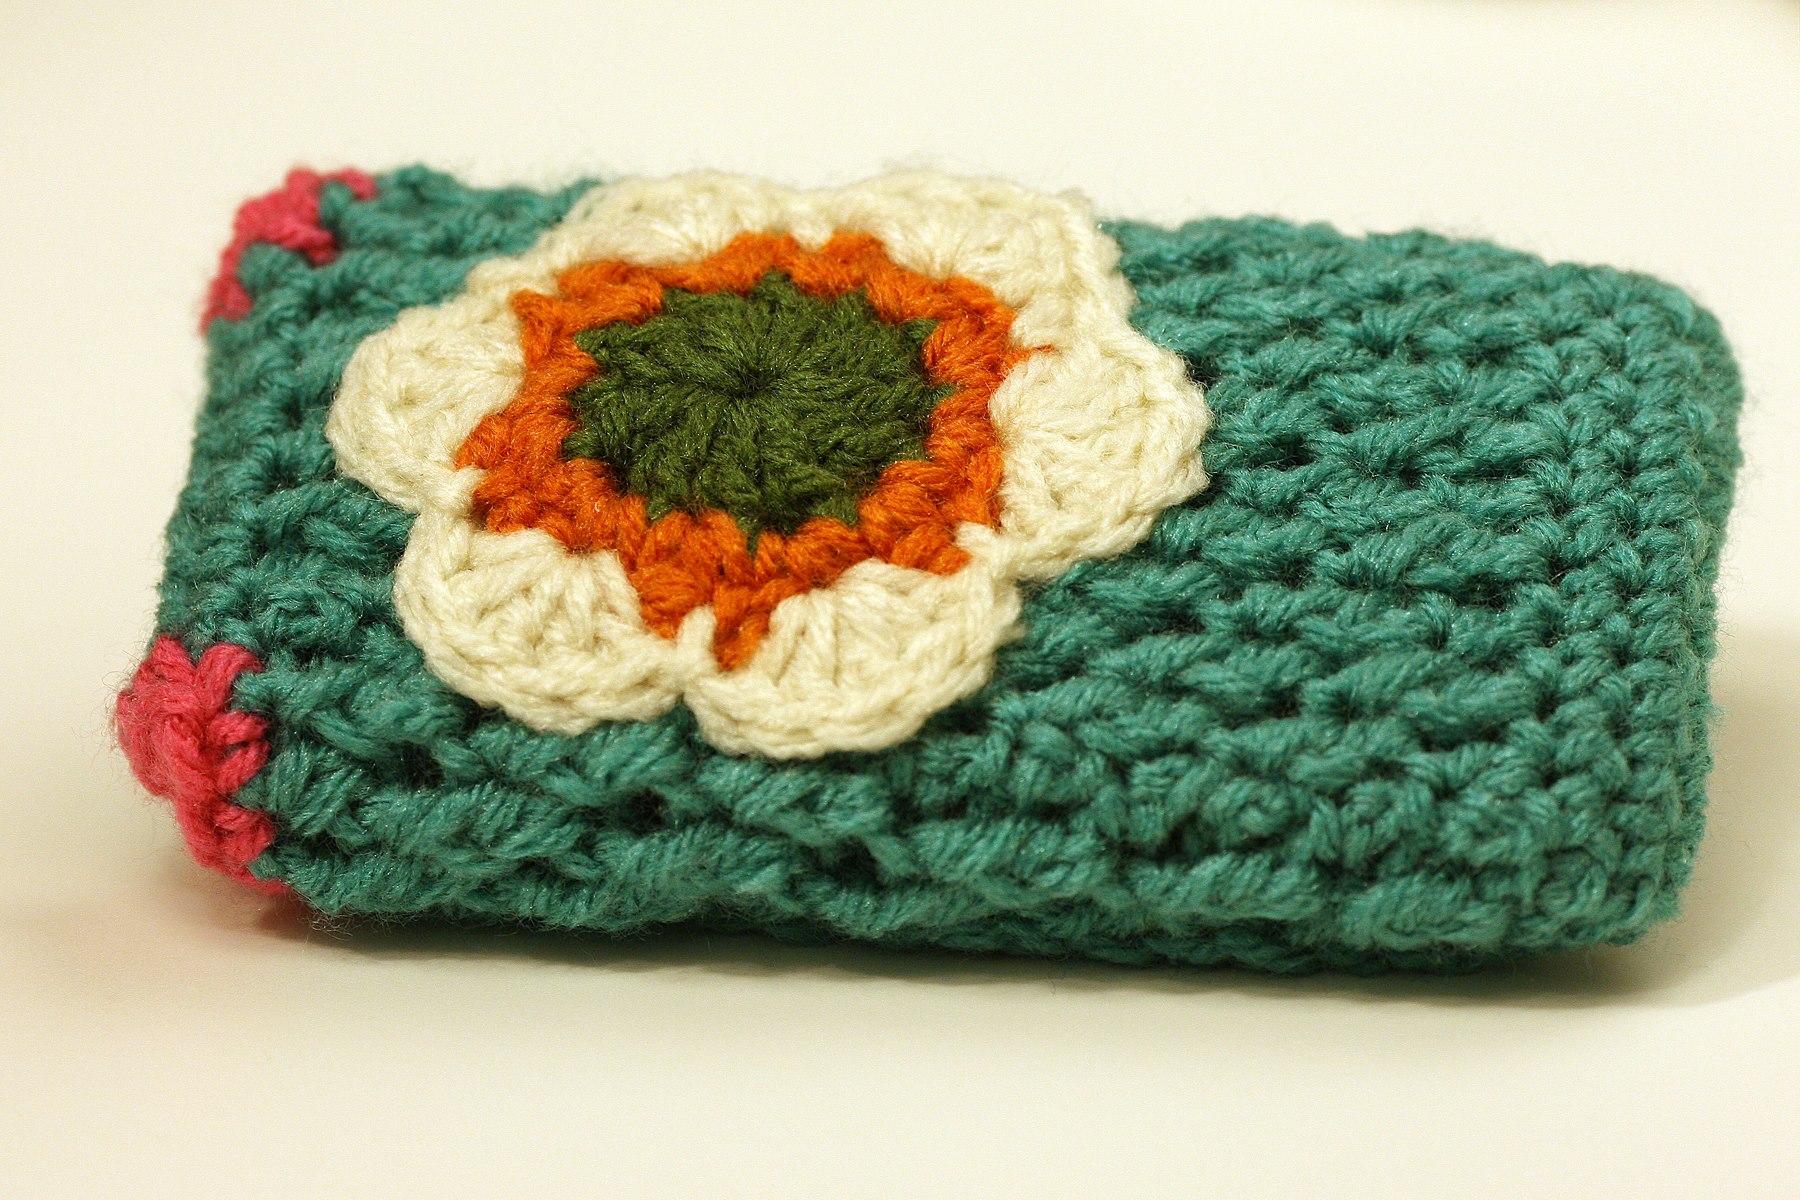 Crochet Tutorial Cell Phone Case With Secret Pocket Yarnutopia By